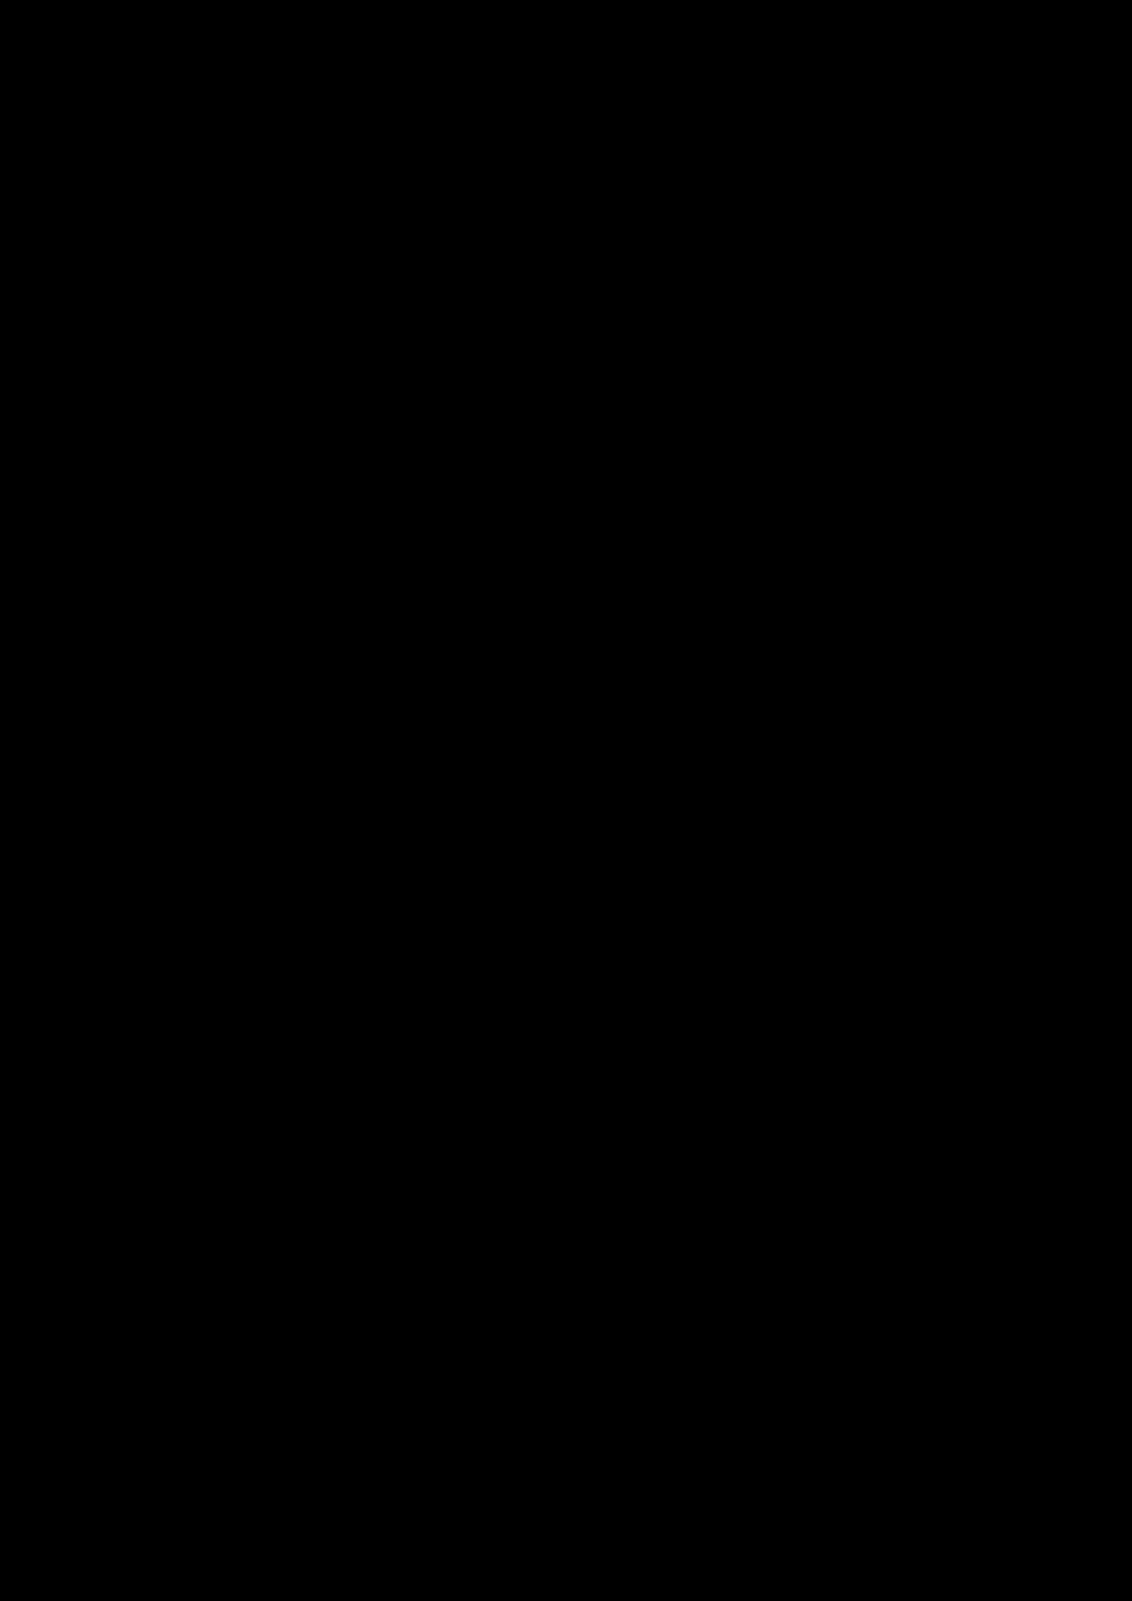 Okean Pustotyi slide, Image 44